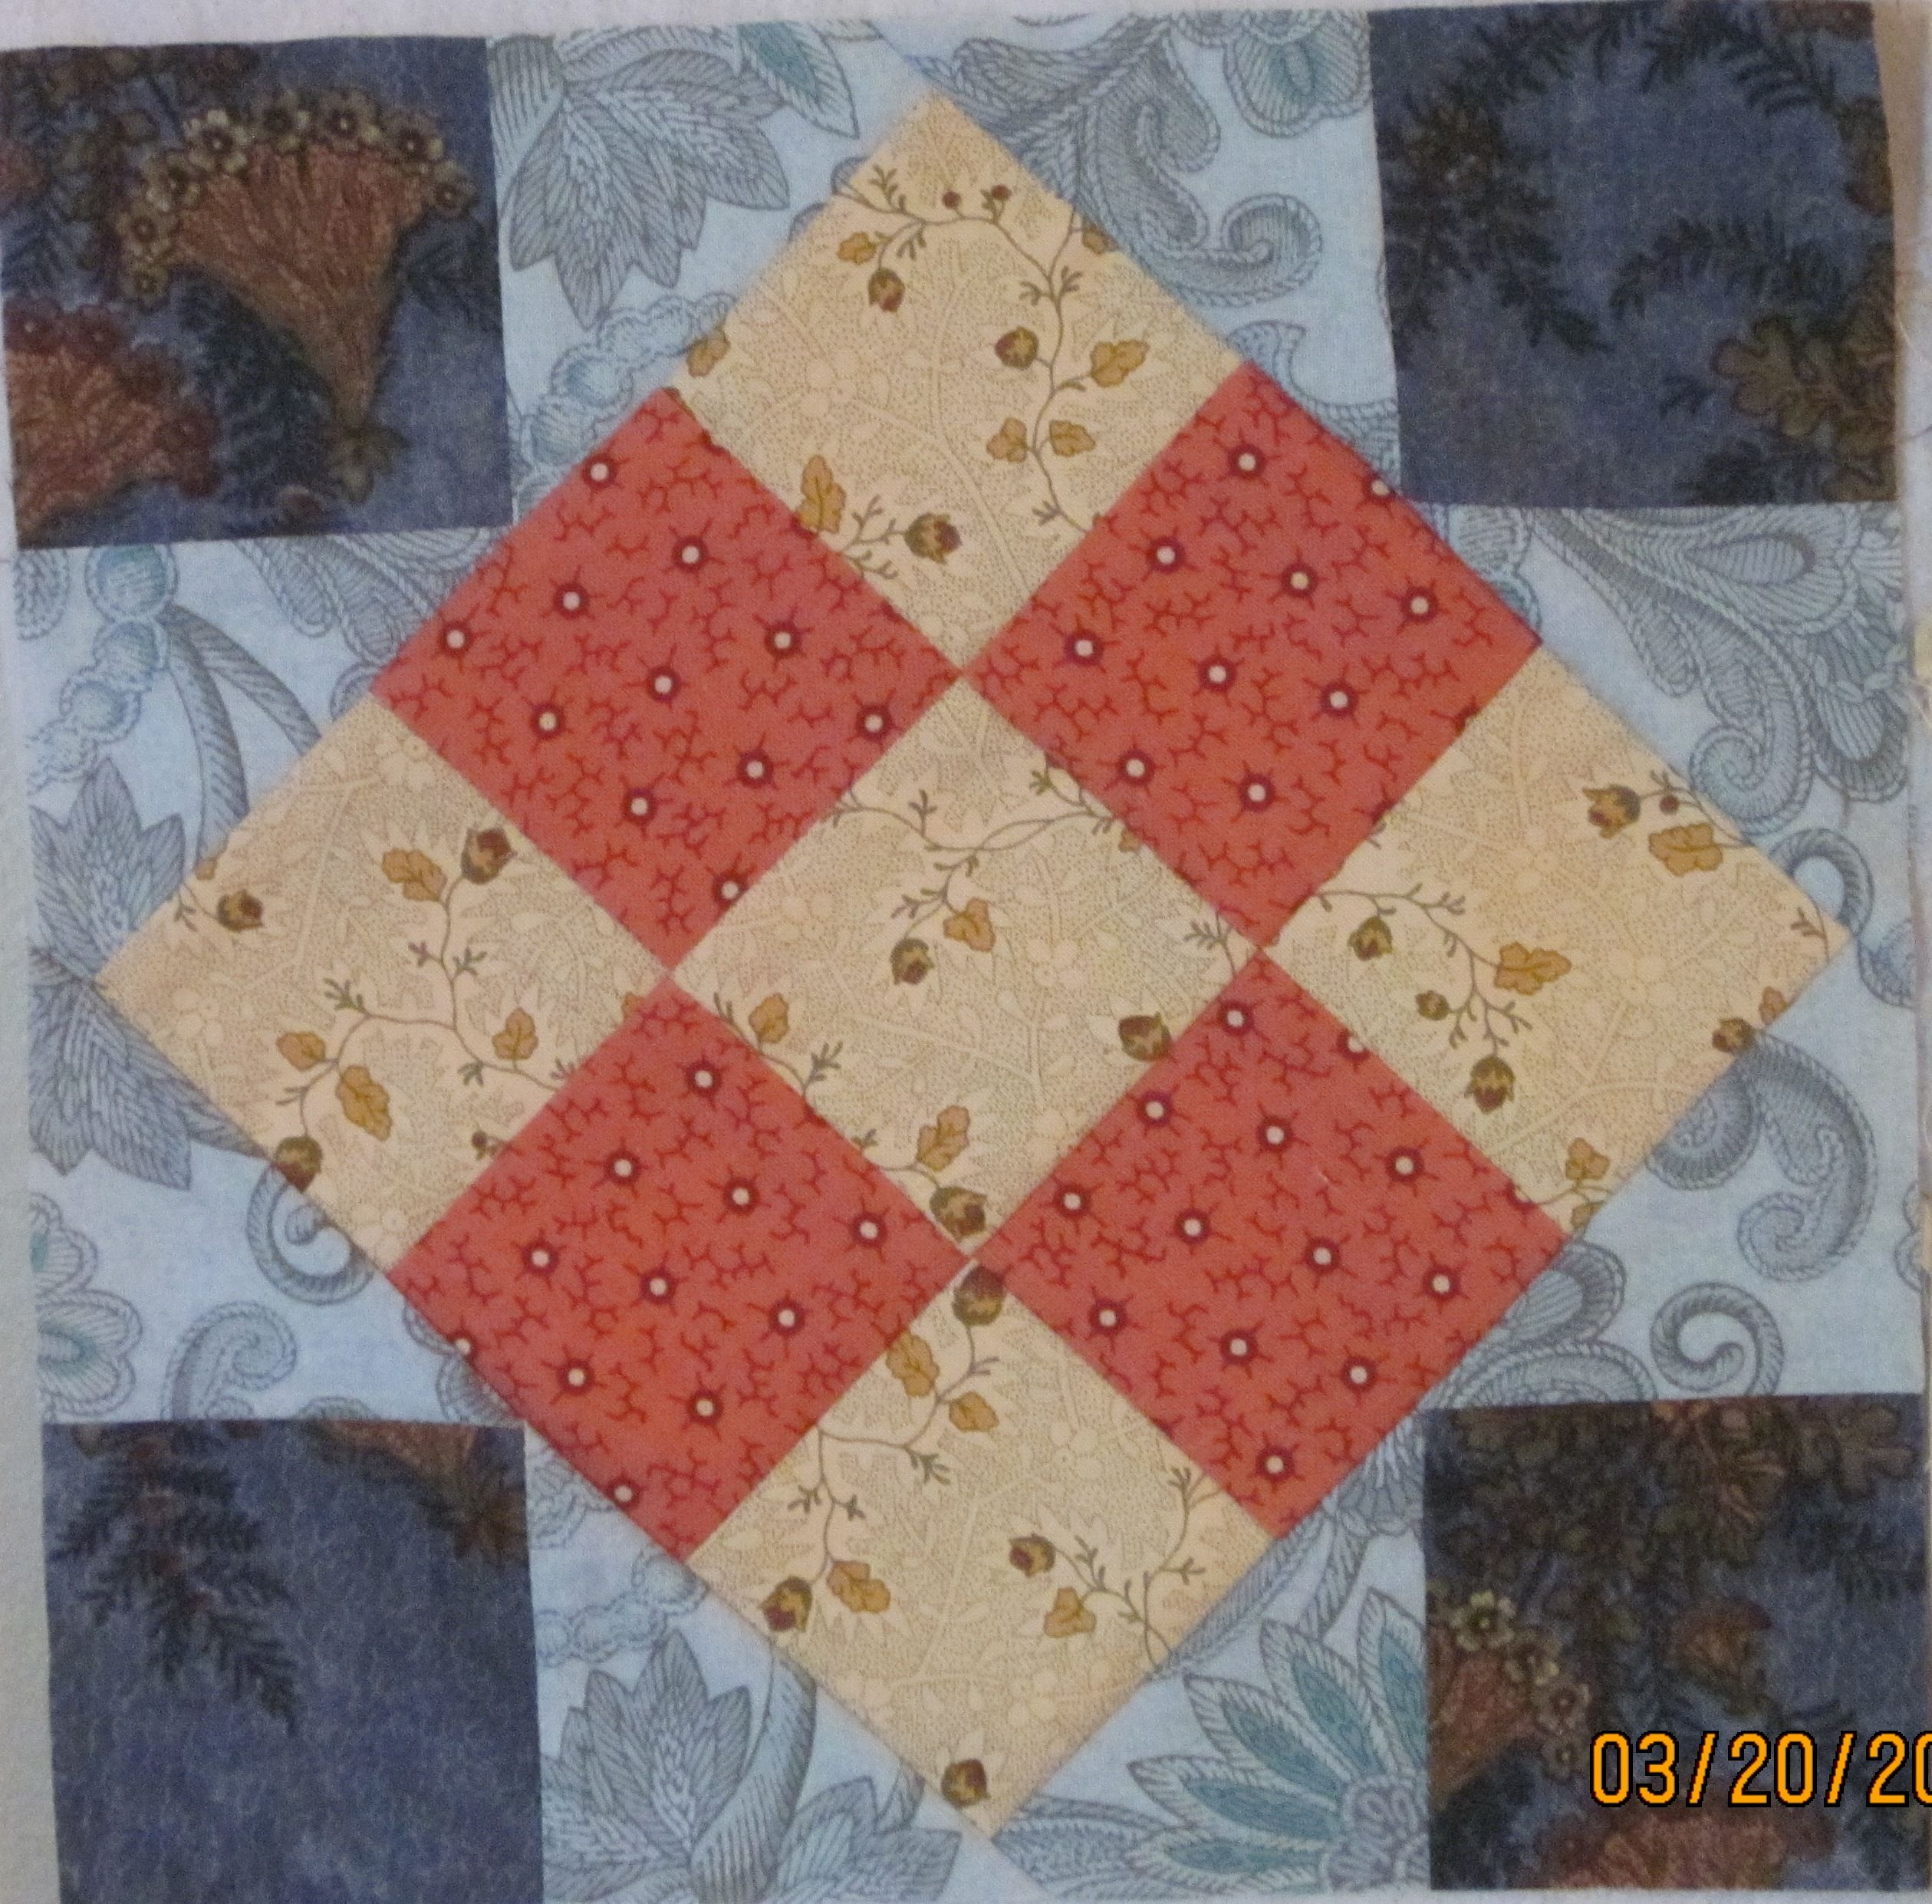 Ferrell Checkered Area Rug: Civil War Quilt Blocks 2012